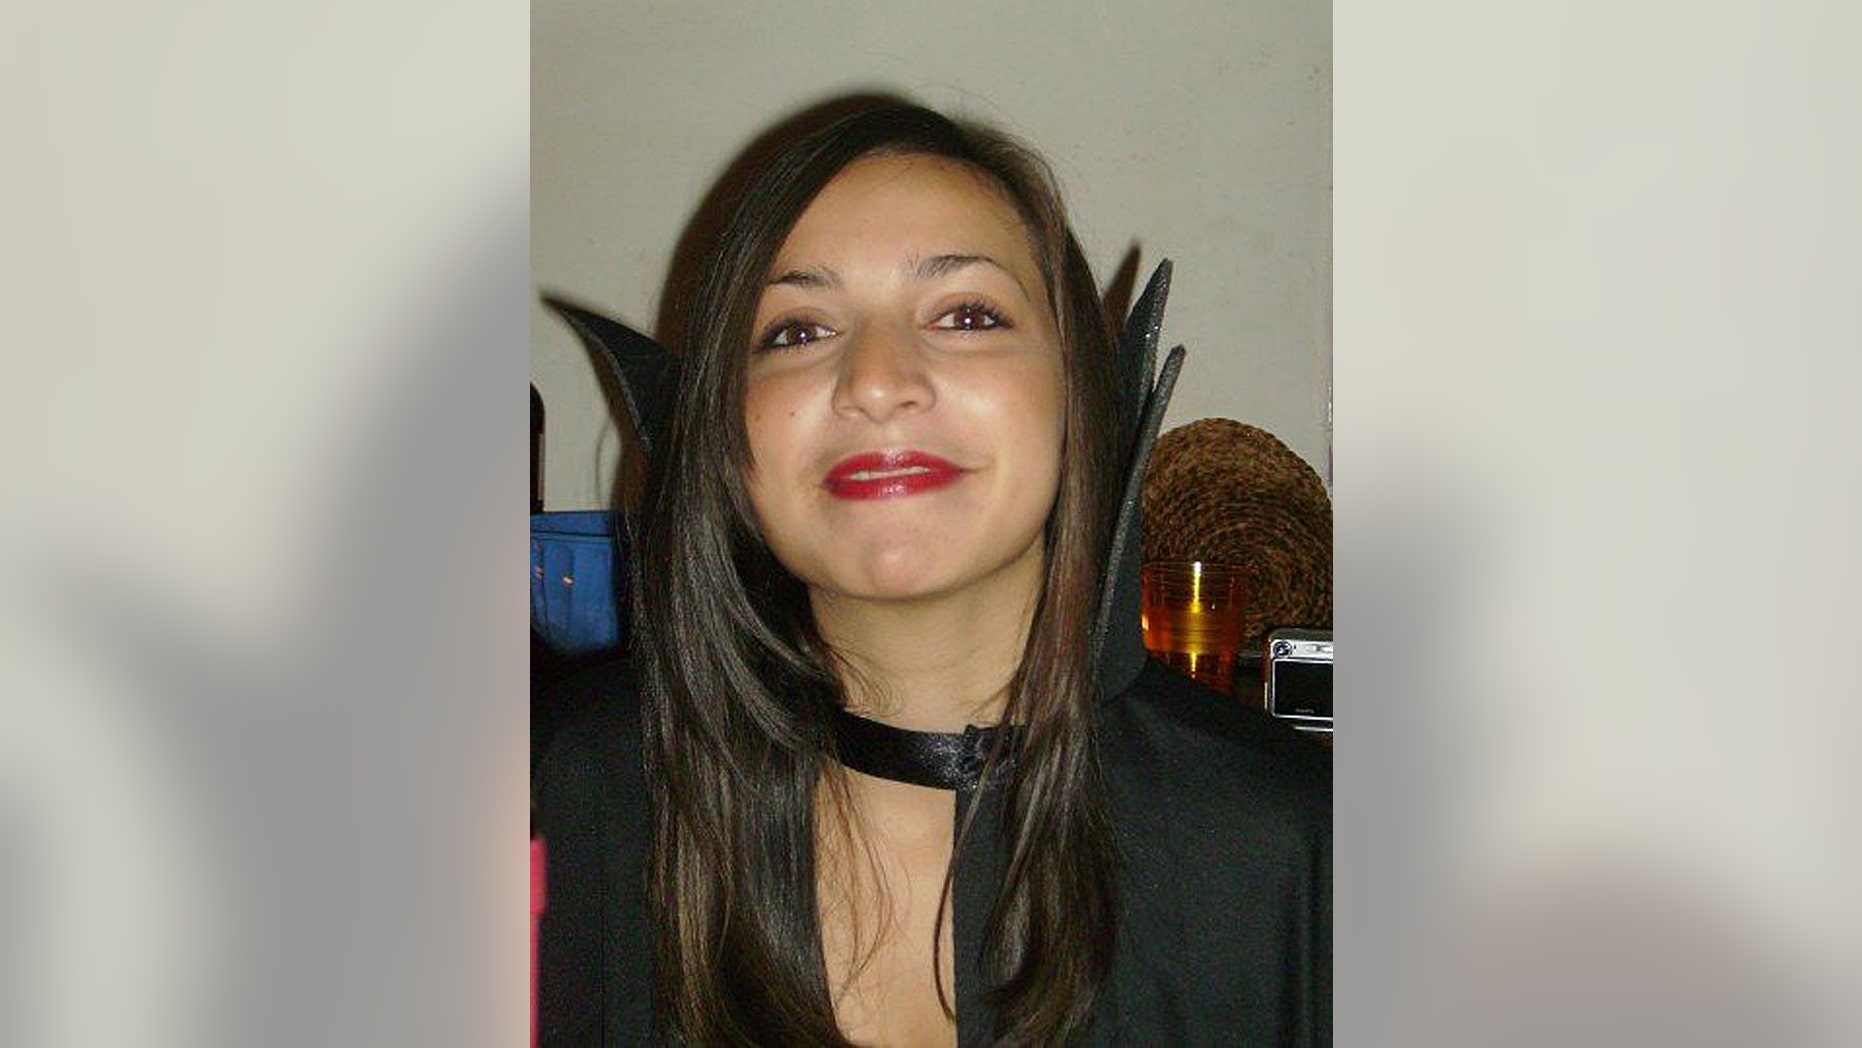 21-year-old murdered British university student Meredith Kercher